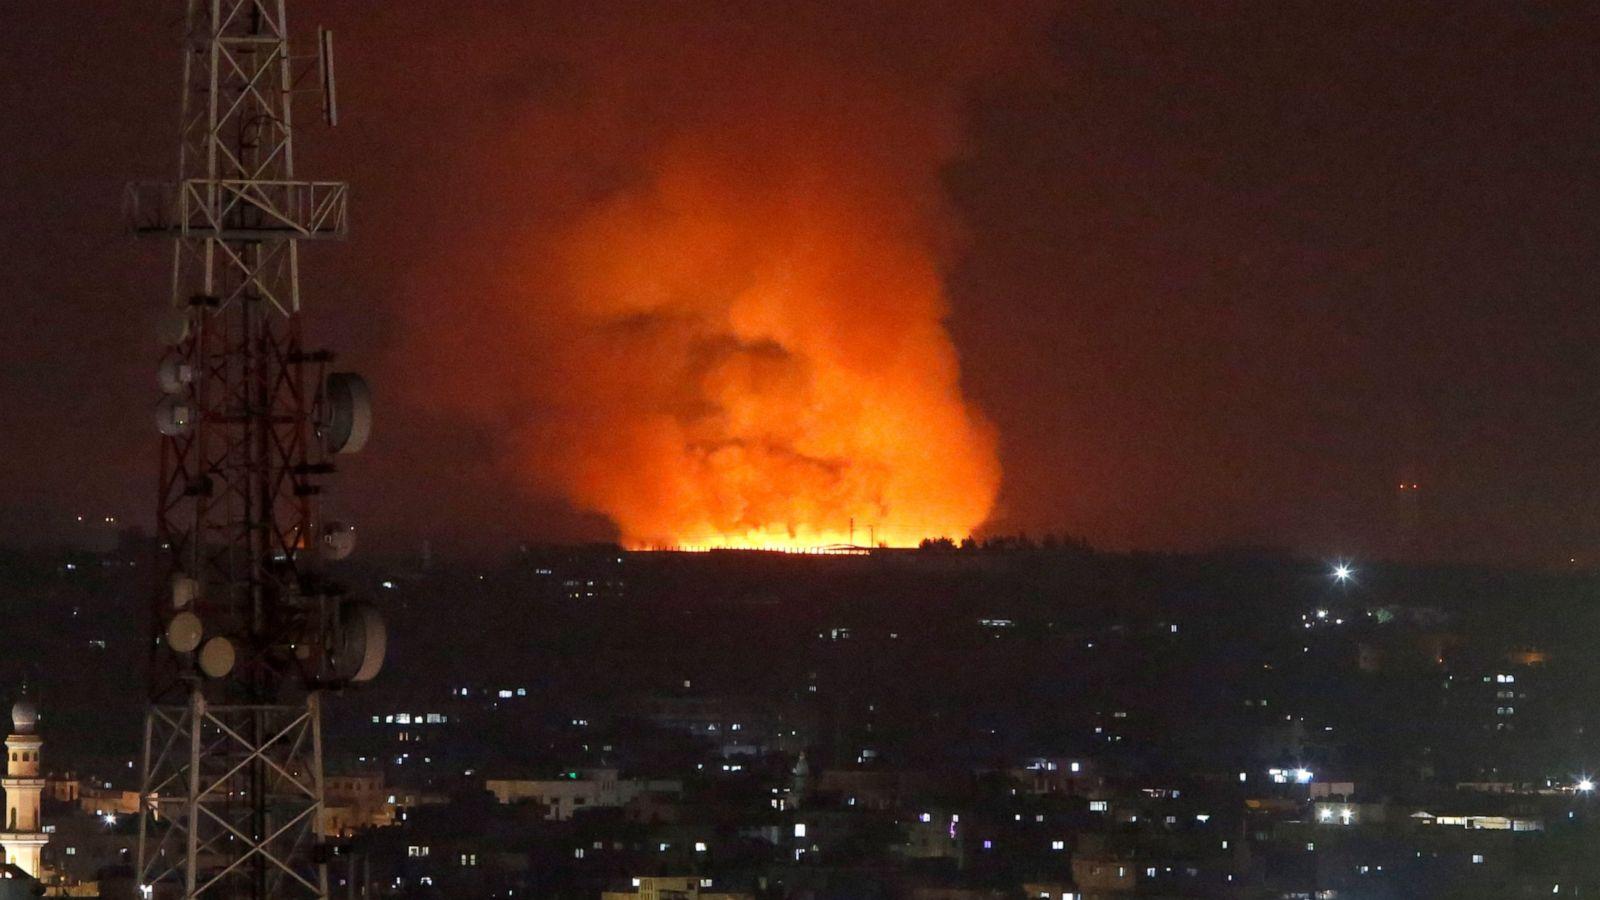 World Leaders Condemn Gaza Strip Attacks On Israel, Lend Support To Israeli Self Defense